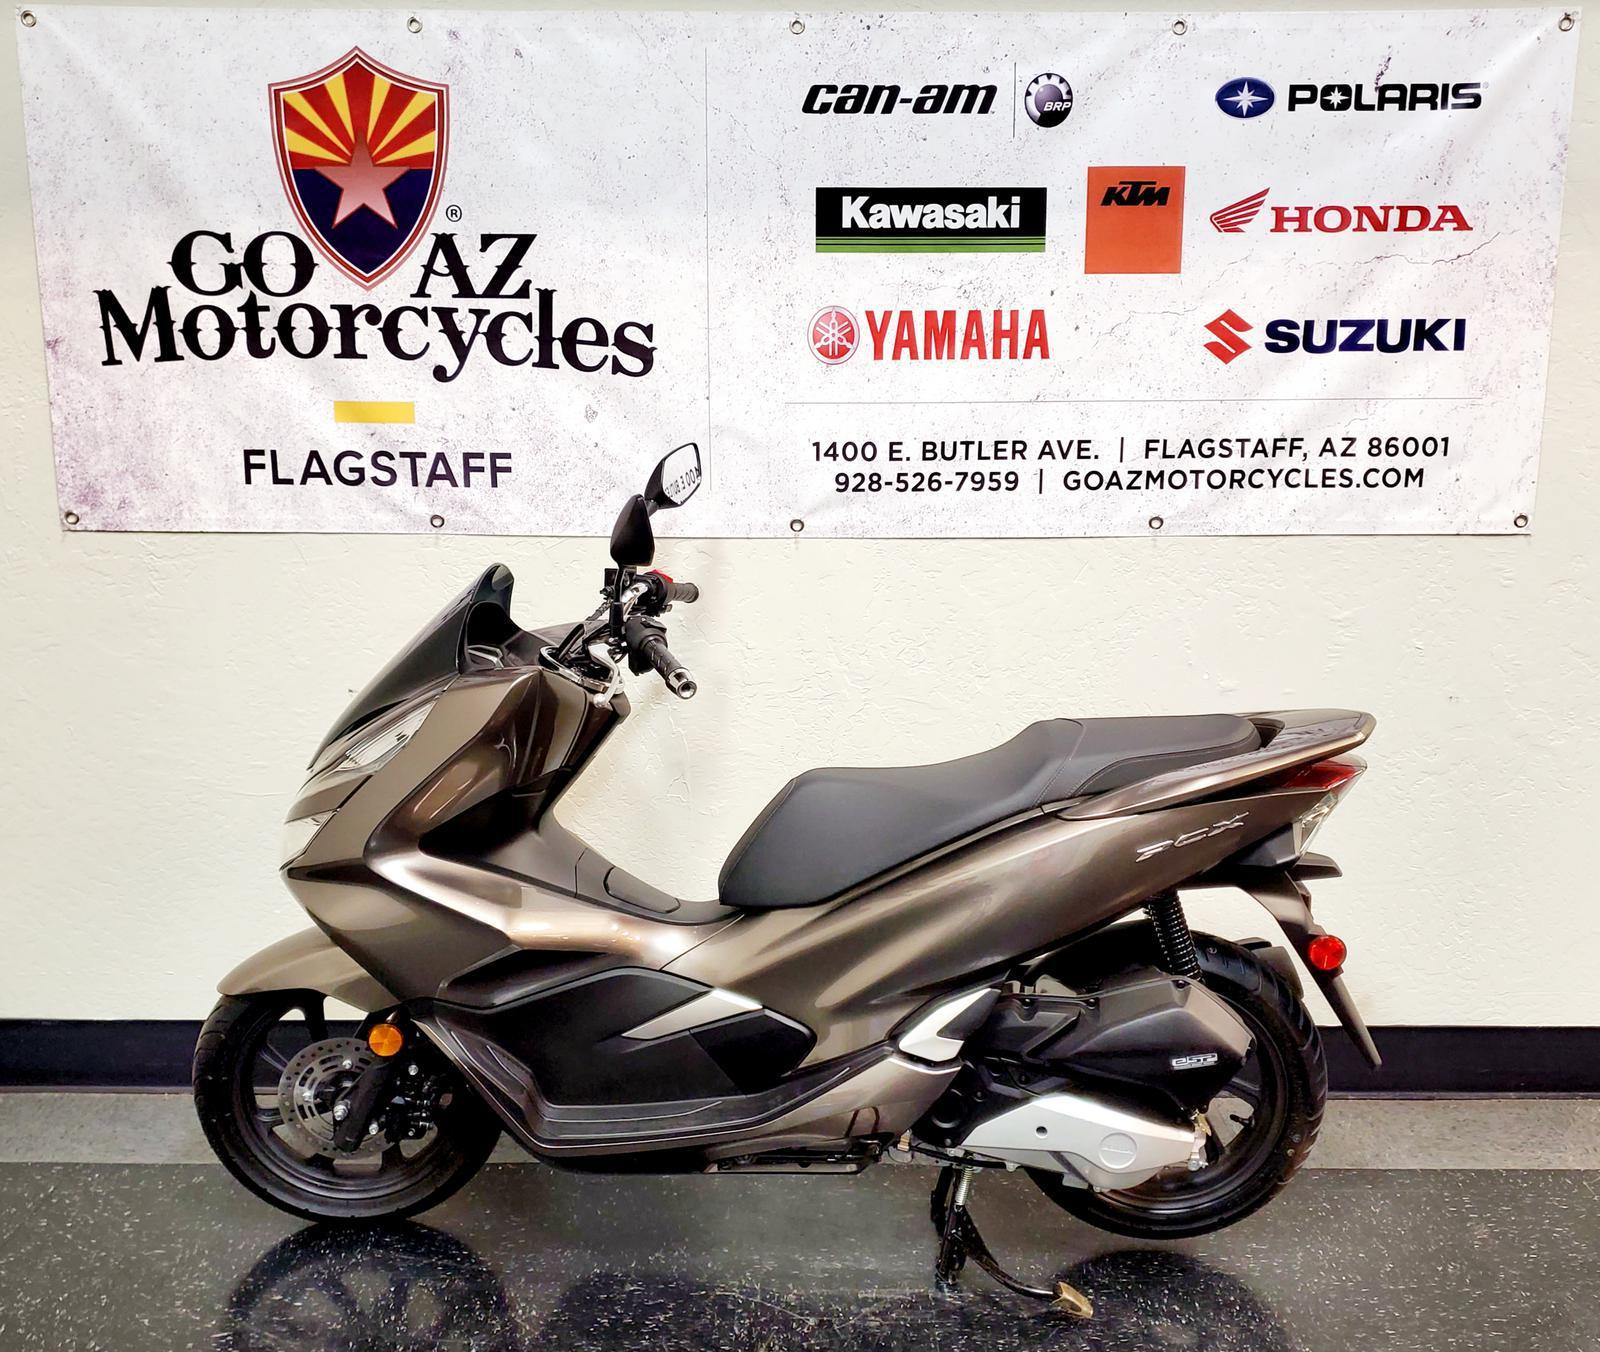 Inventory From Polaris Industries And Honda Go Az Motorcycles In Flagstaff Flagstaff Az 928 526 7959